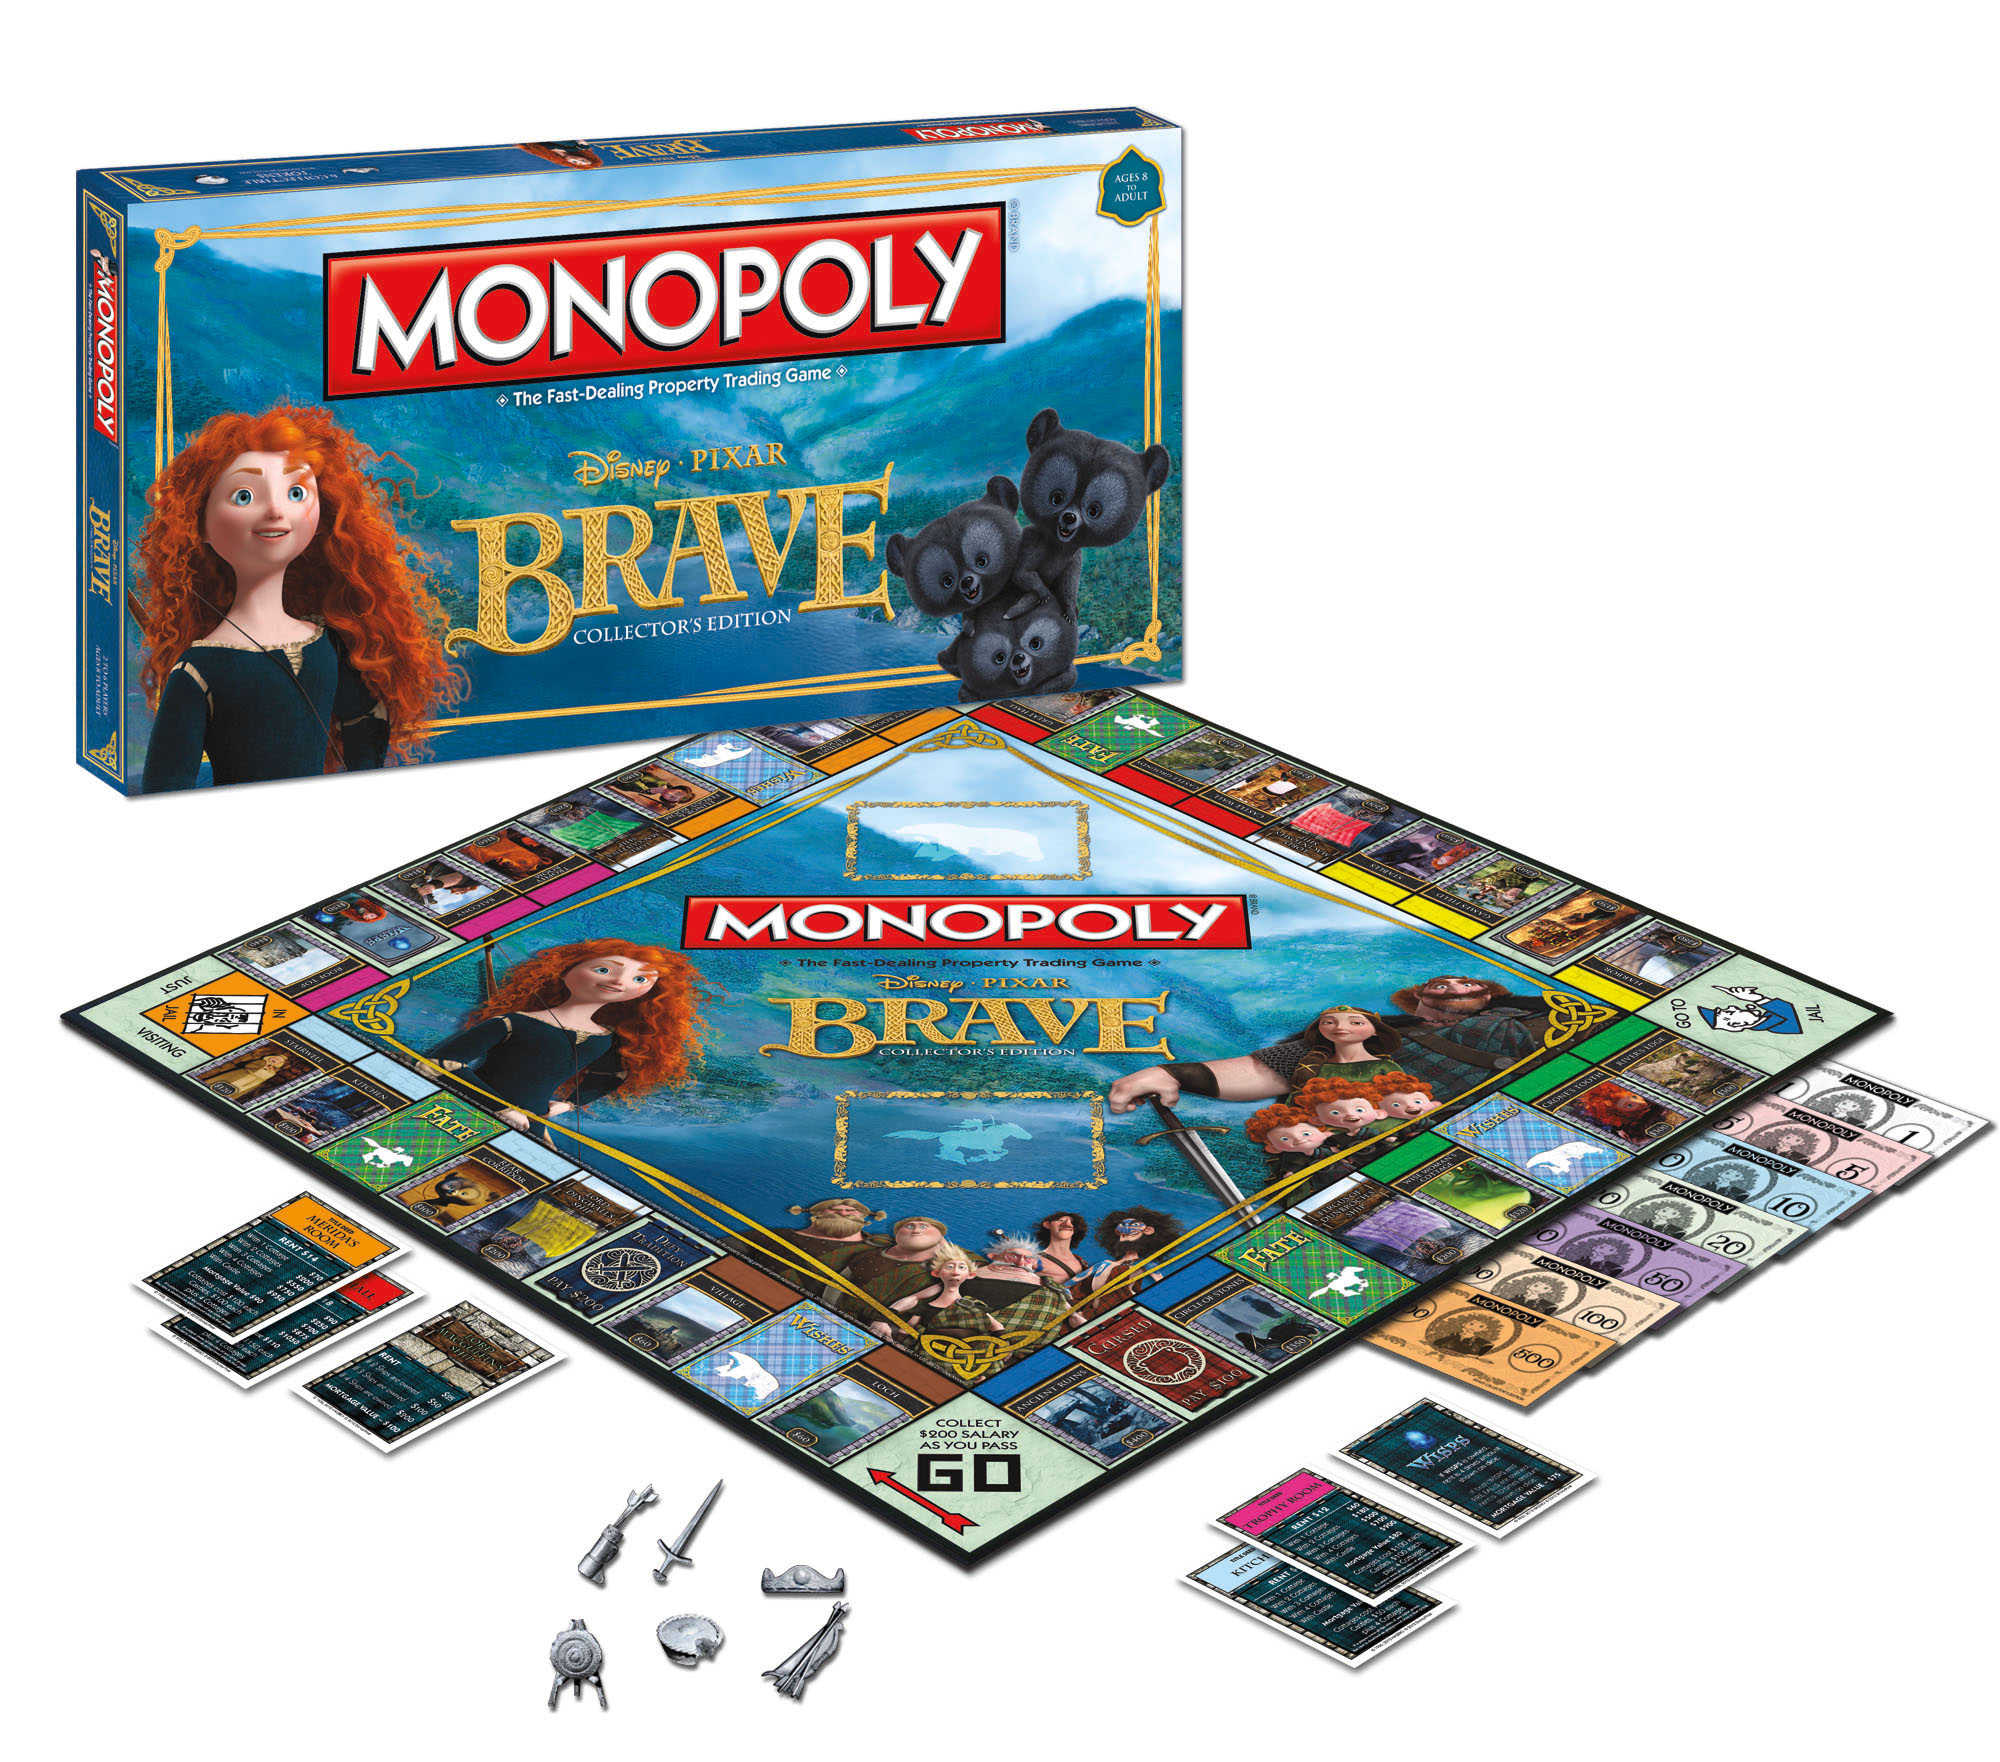 Brave Monopoly